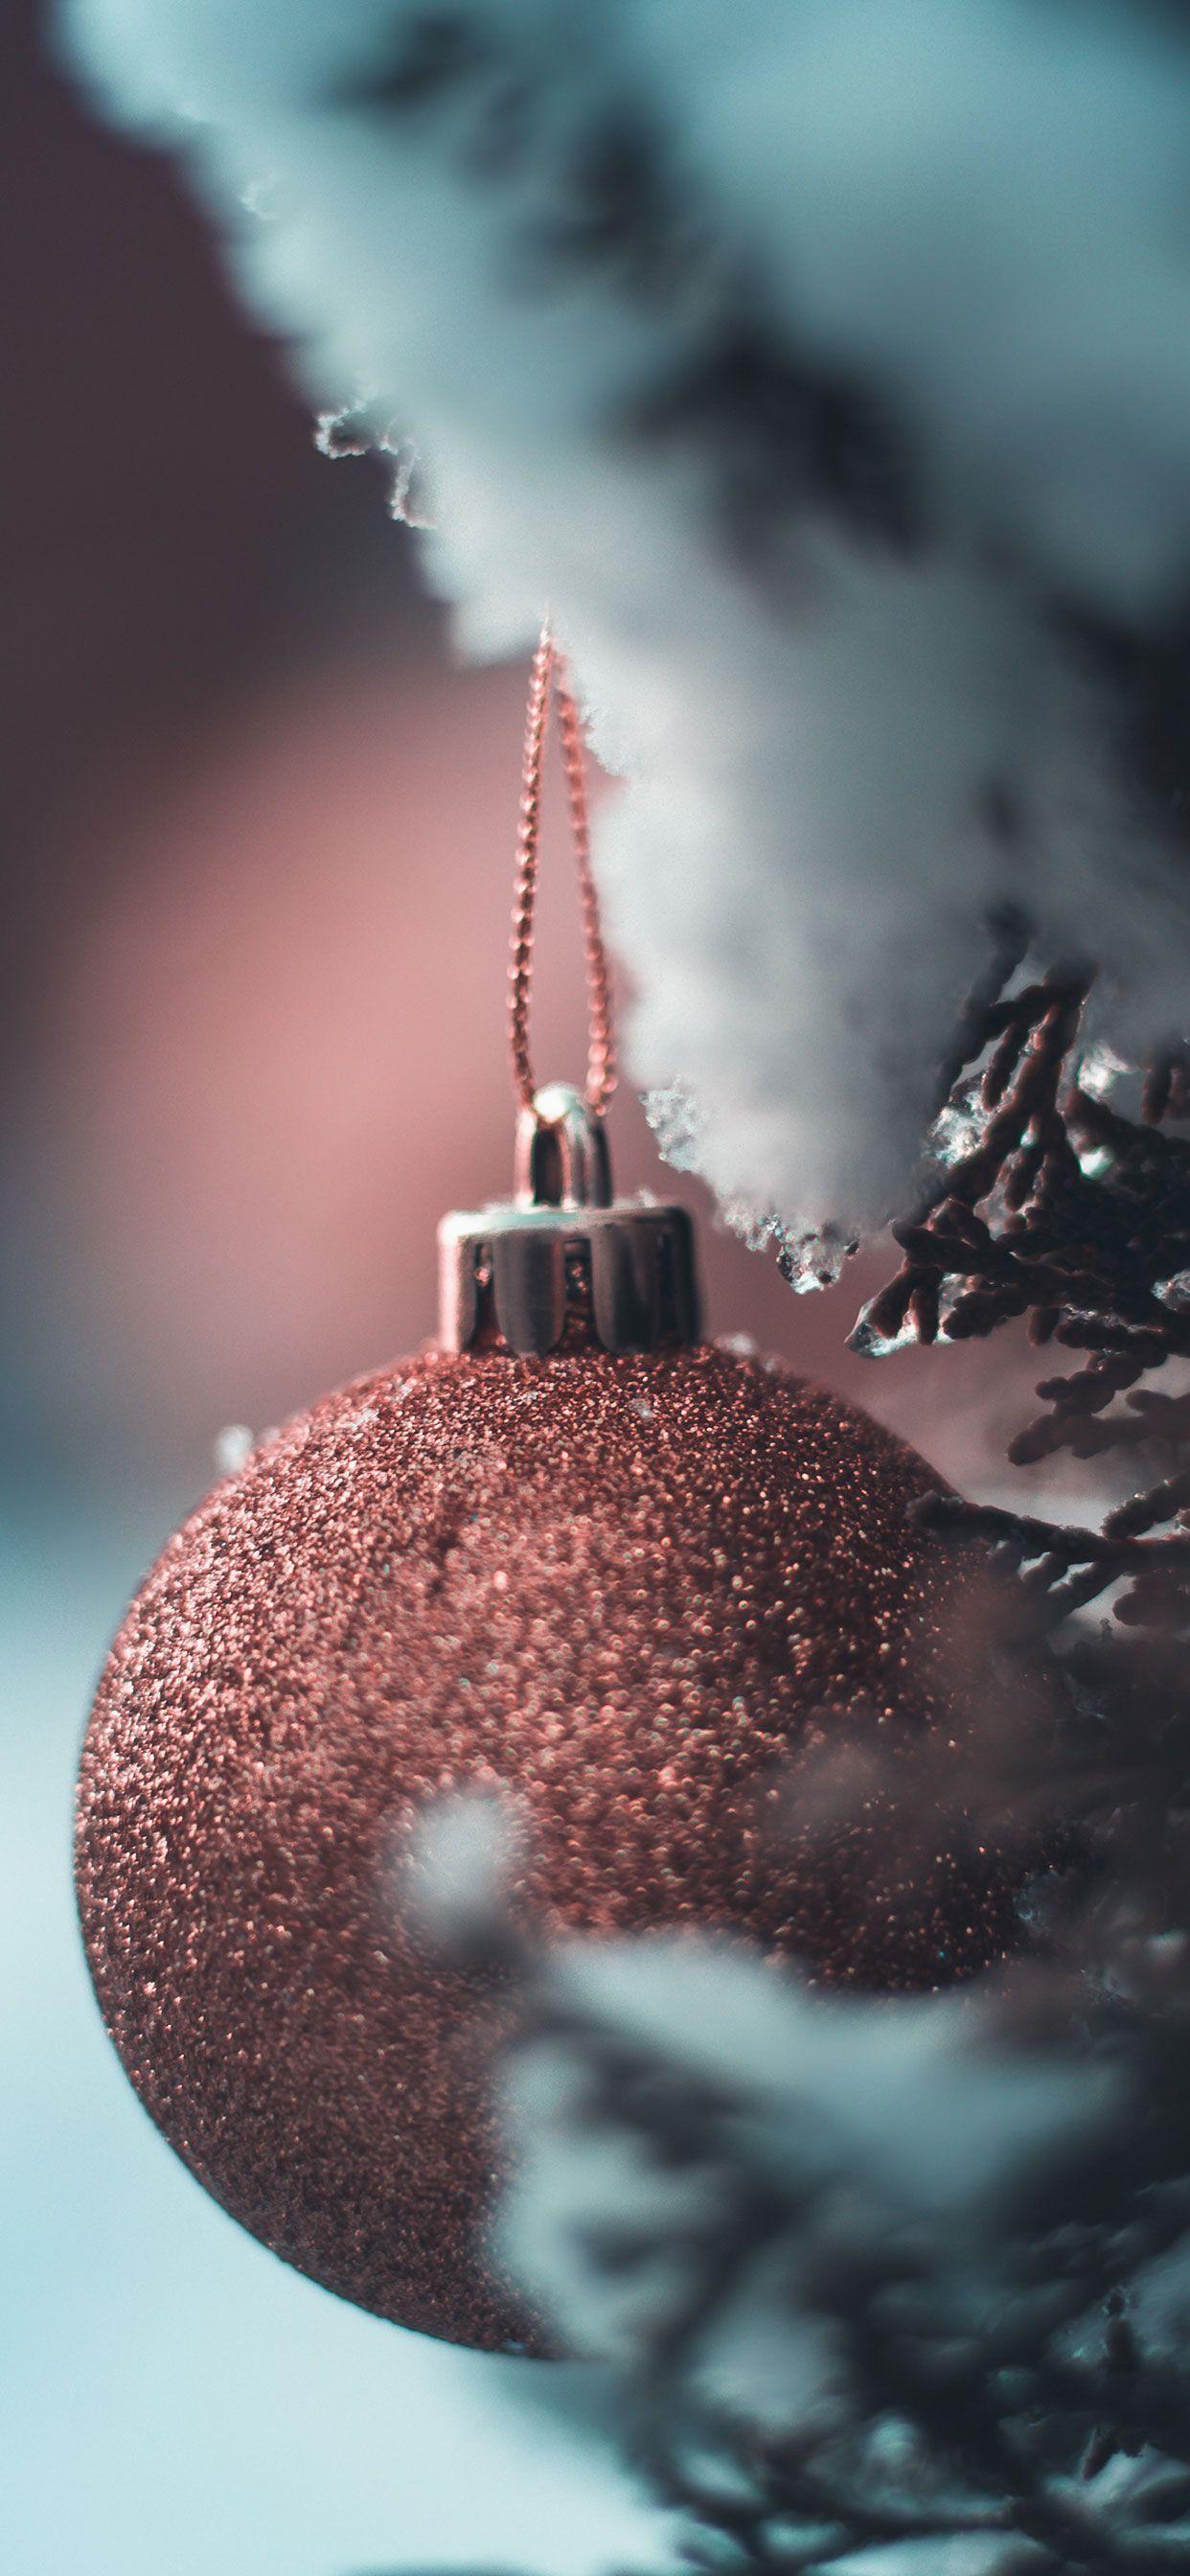 40 Stunning Iphone Xs And Xs Max Christmas Wallpapers Christmaswallpaperiphone I Christmas Phone Wallpaper Cute Christmas Wallpaper Wallpaper Iphone Christmas